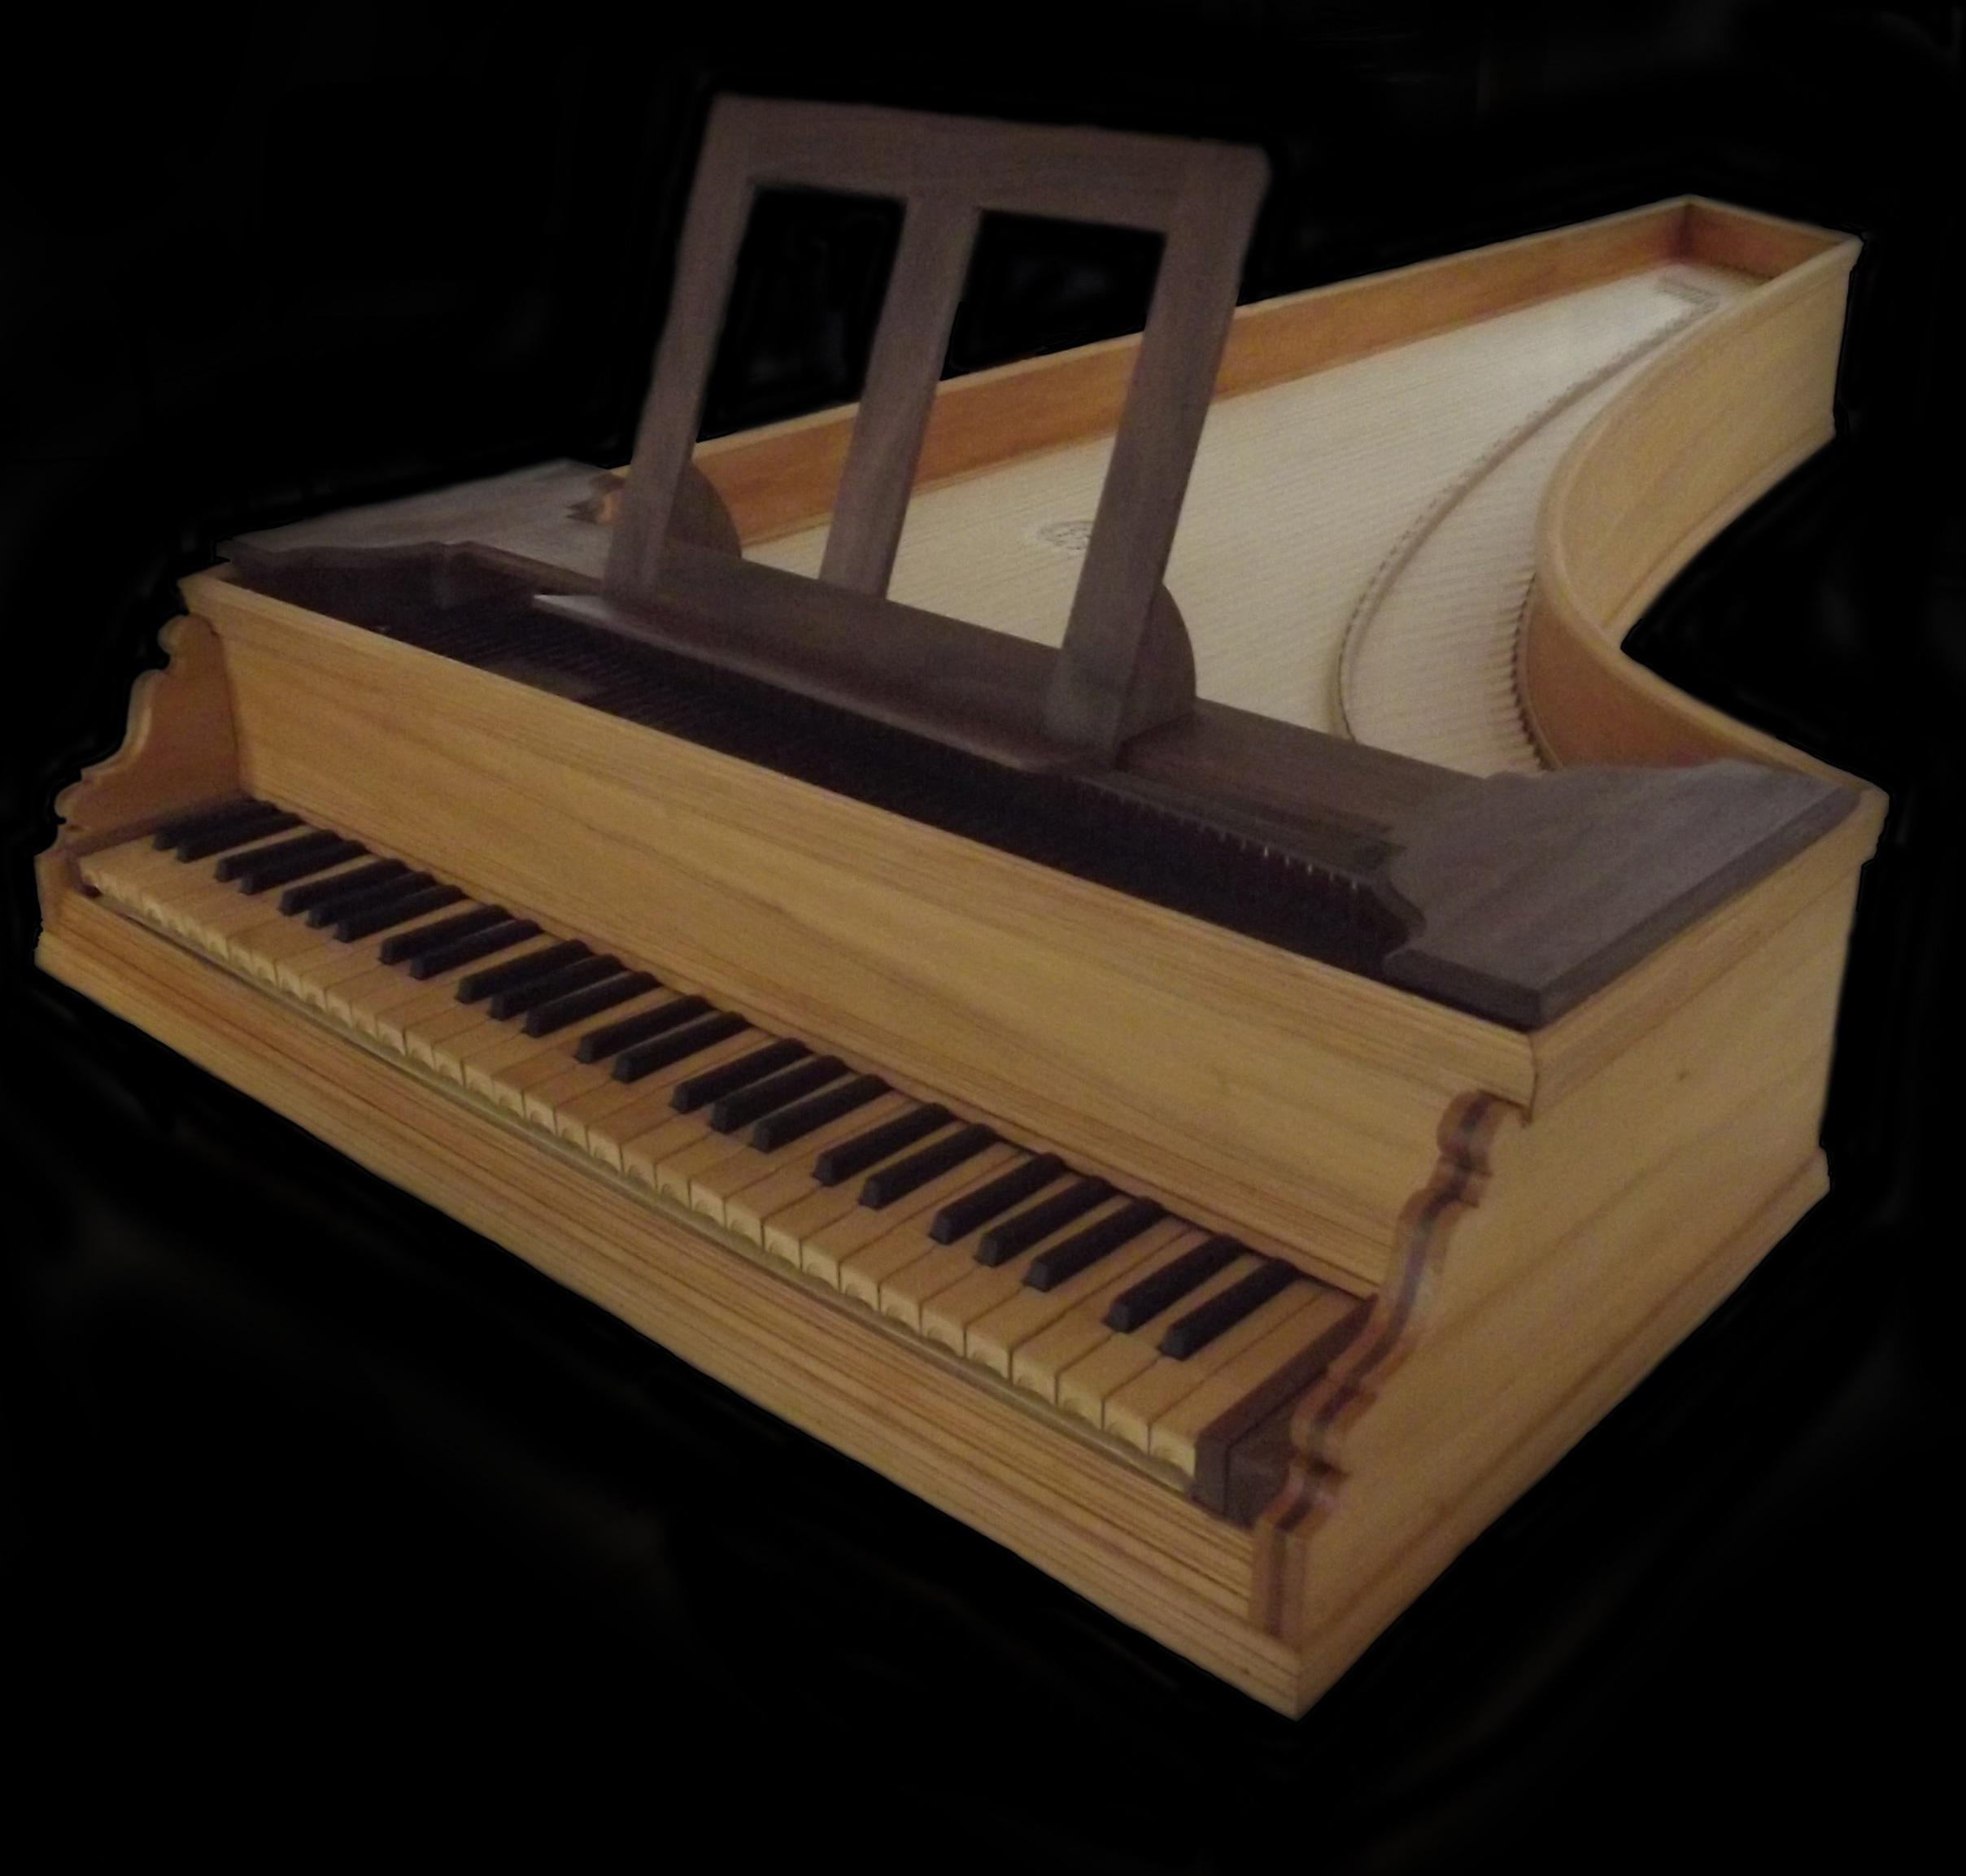 Opus+471+Italian+Harpsichord.jpg